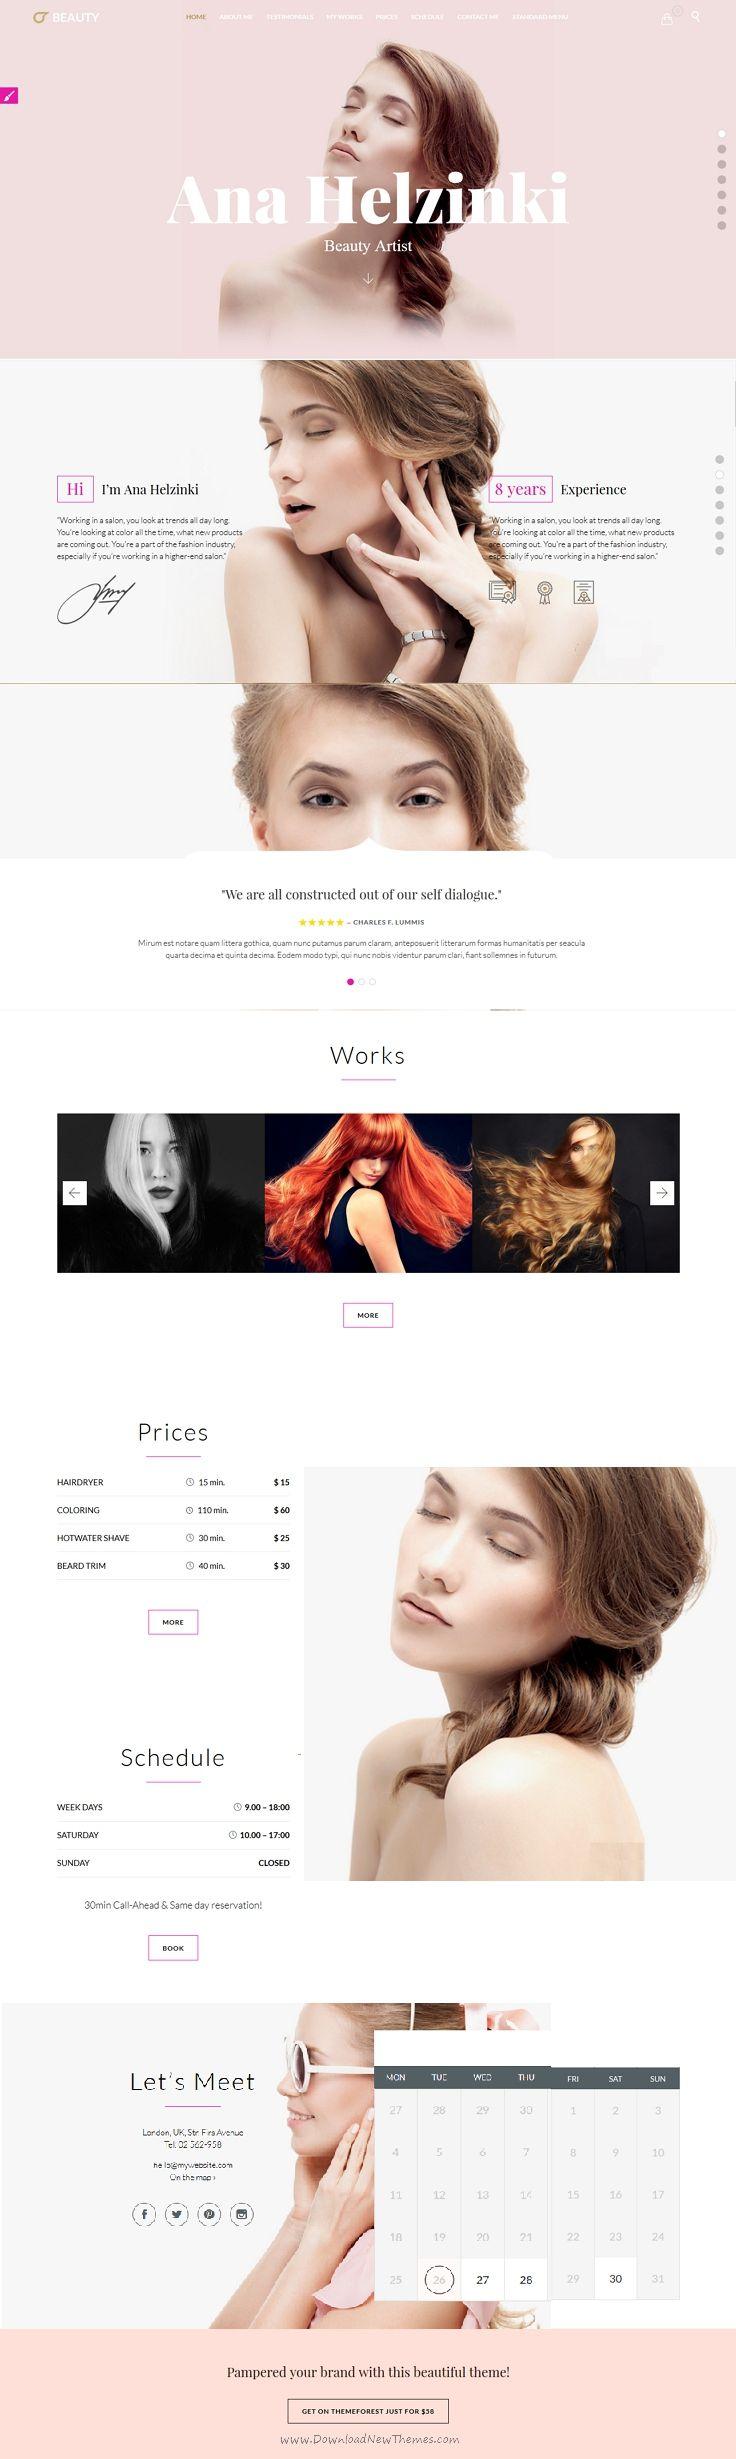 Beauty Hair Salon is wonderful multipurpose 5 in 1 #WordPress Theme for Hair #Salon , Barber Shop or #Beauty Salon website download now➝ https://themeforest.net/item/beauty-hair-salon-theme-for-hair-salon-barber-shop-and-beauty-salon/15344439?ref=Datasata